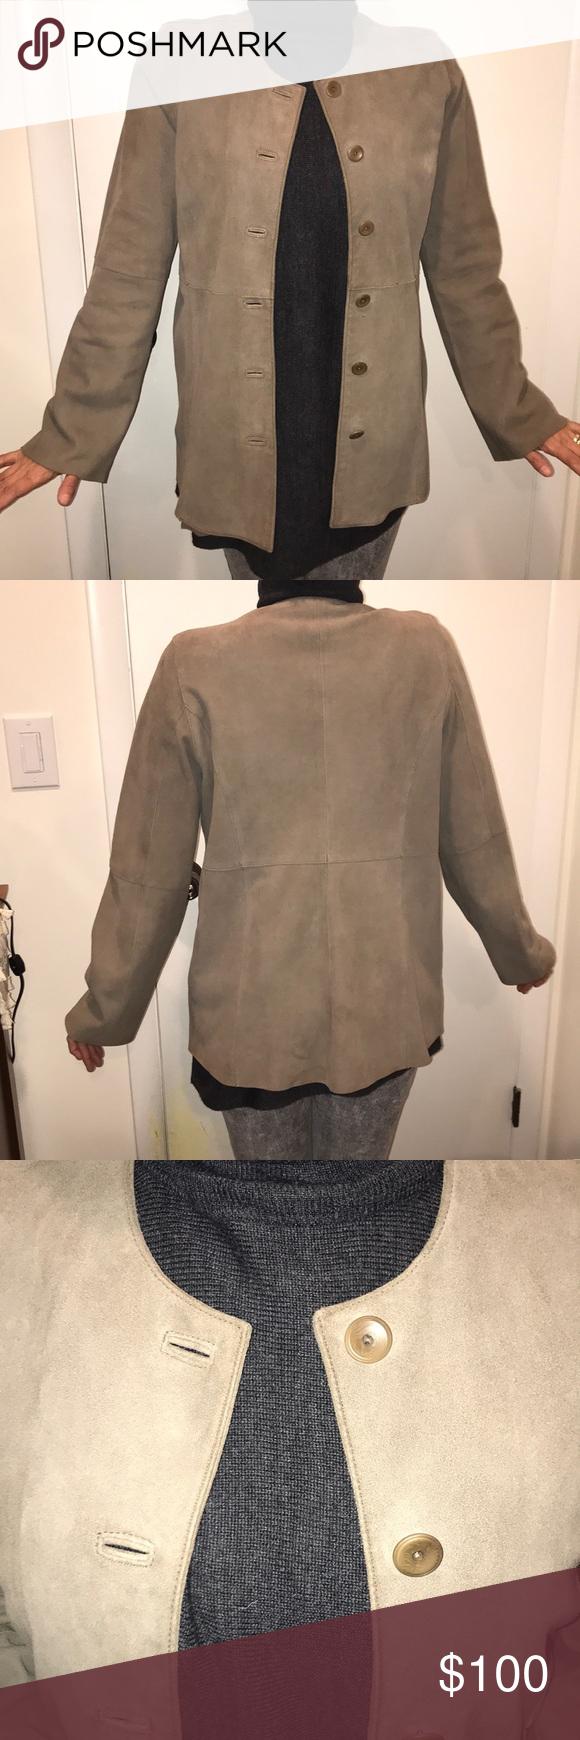 Eileen Fisher Suede Jacket Clothes Design Suede Jacket Eileen Fisher Jacket [ 1740 x 580 Pixel ]